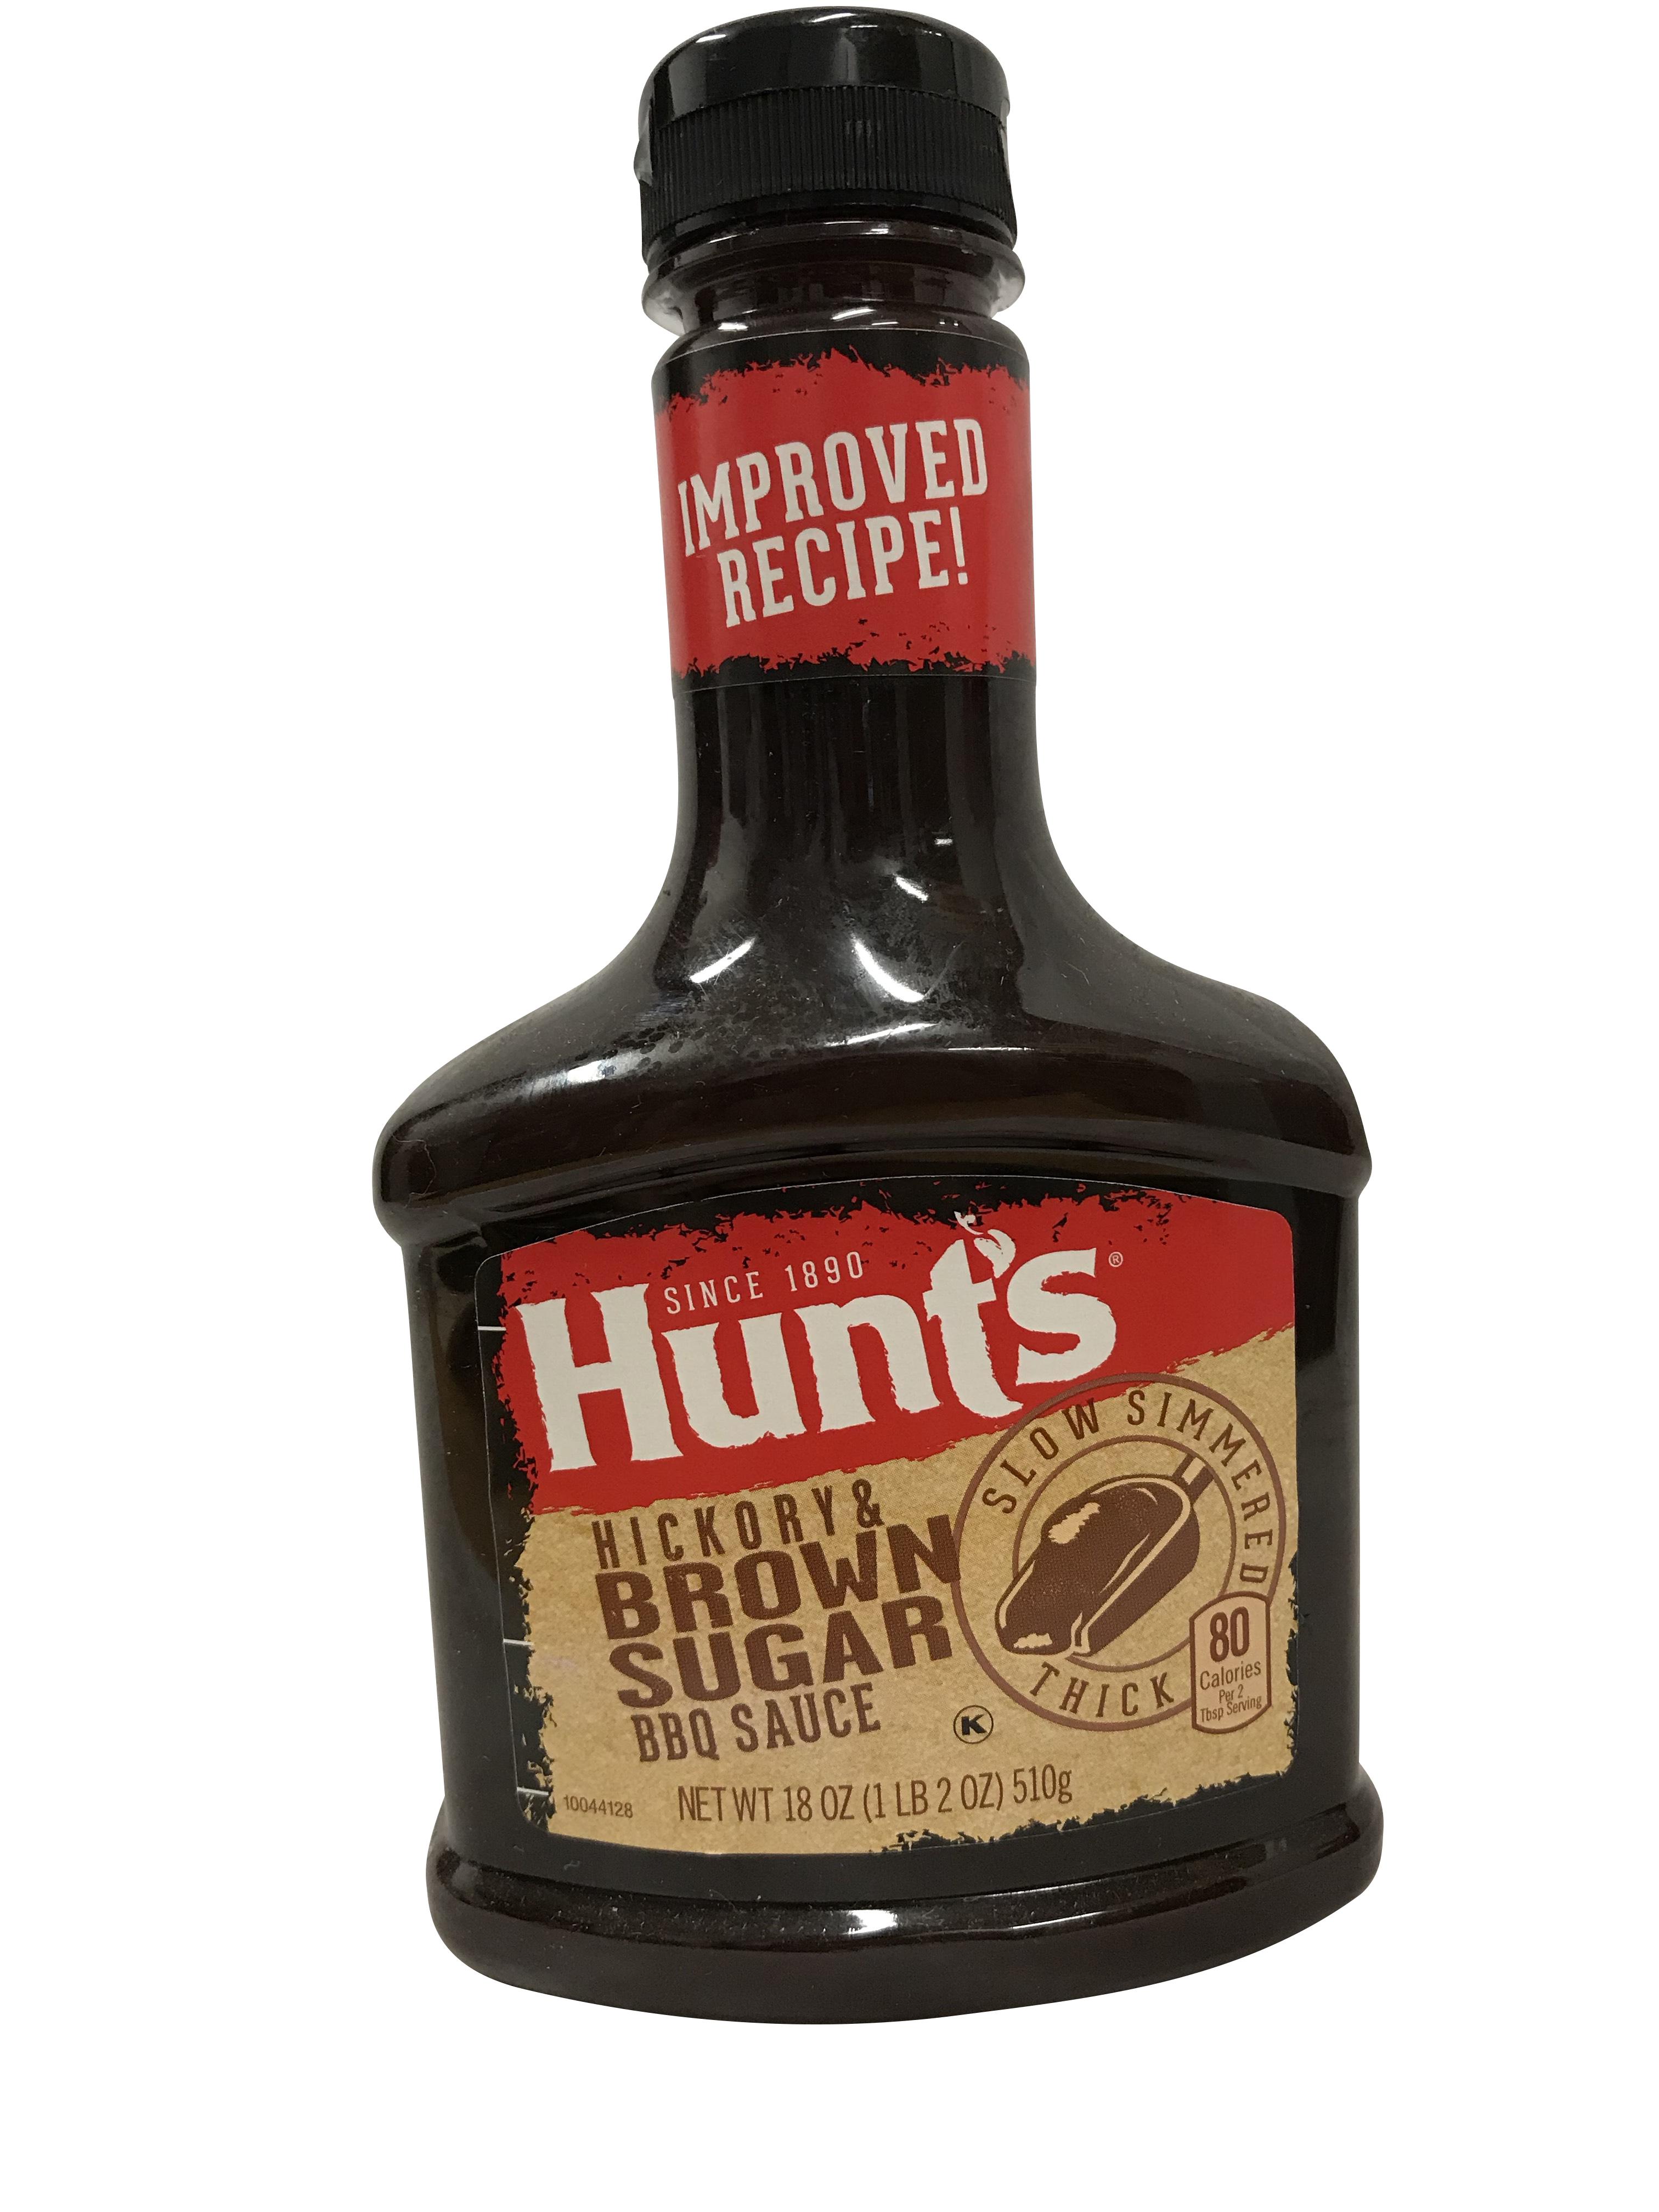 HUNT'S BBQ Sauce Hickory Brown Sugar